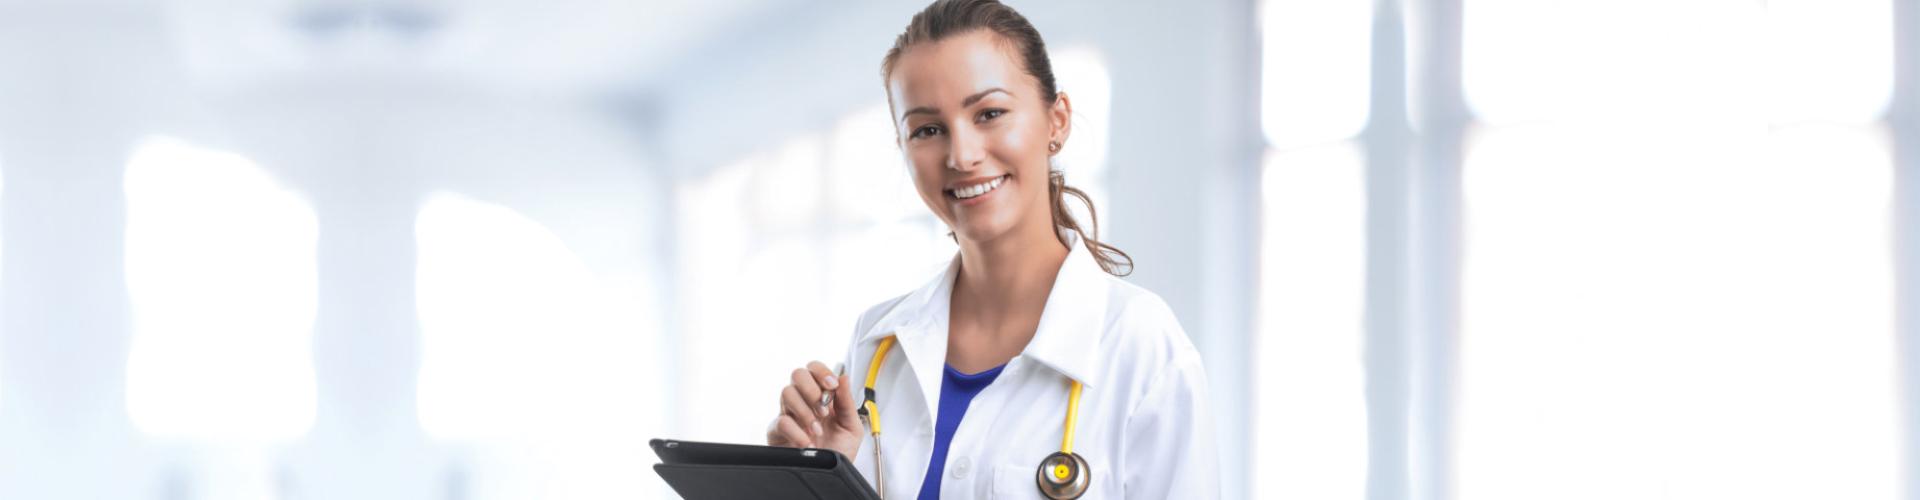 nurse with yellow stethoscope smiling